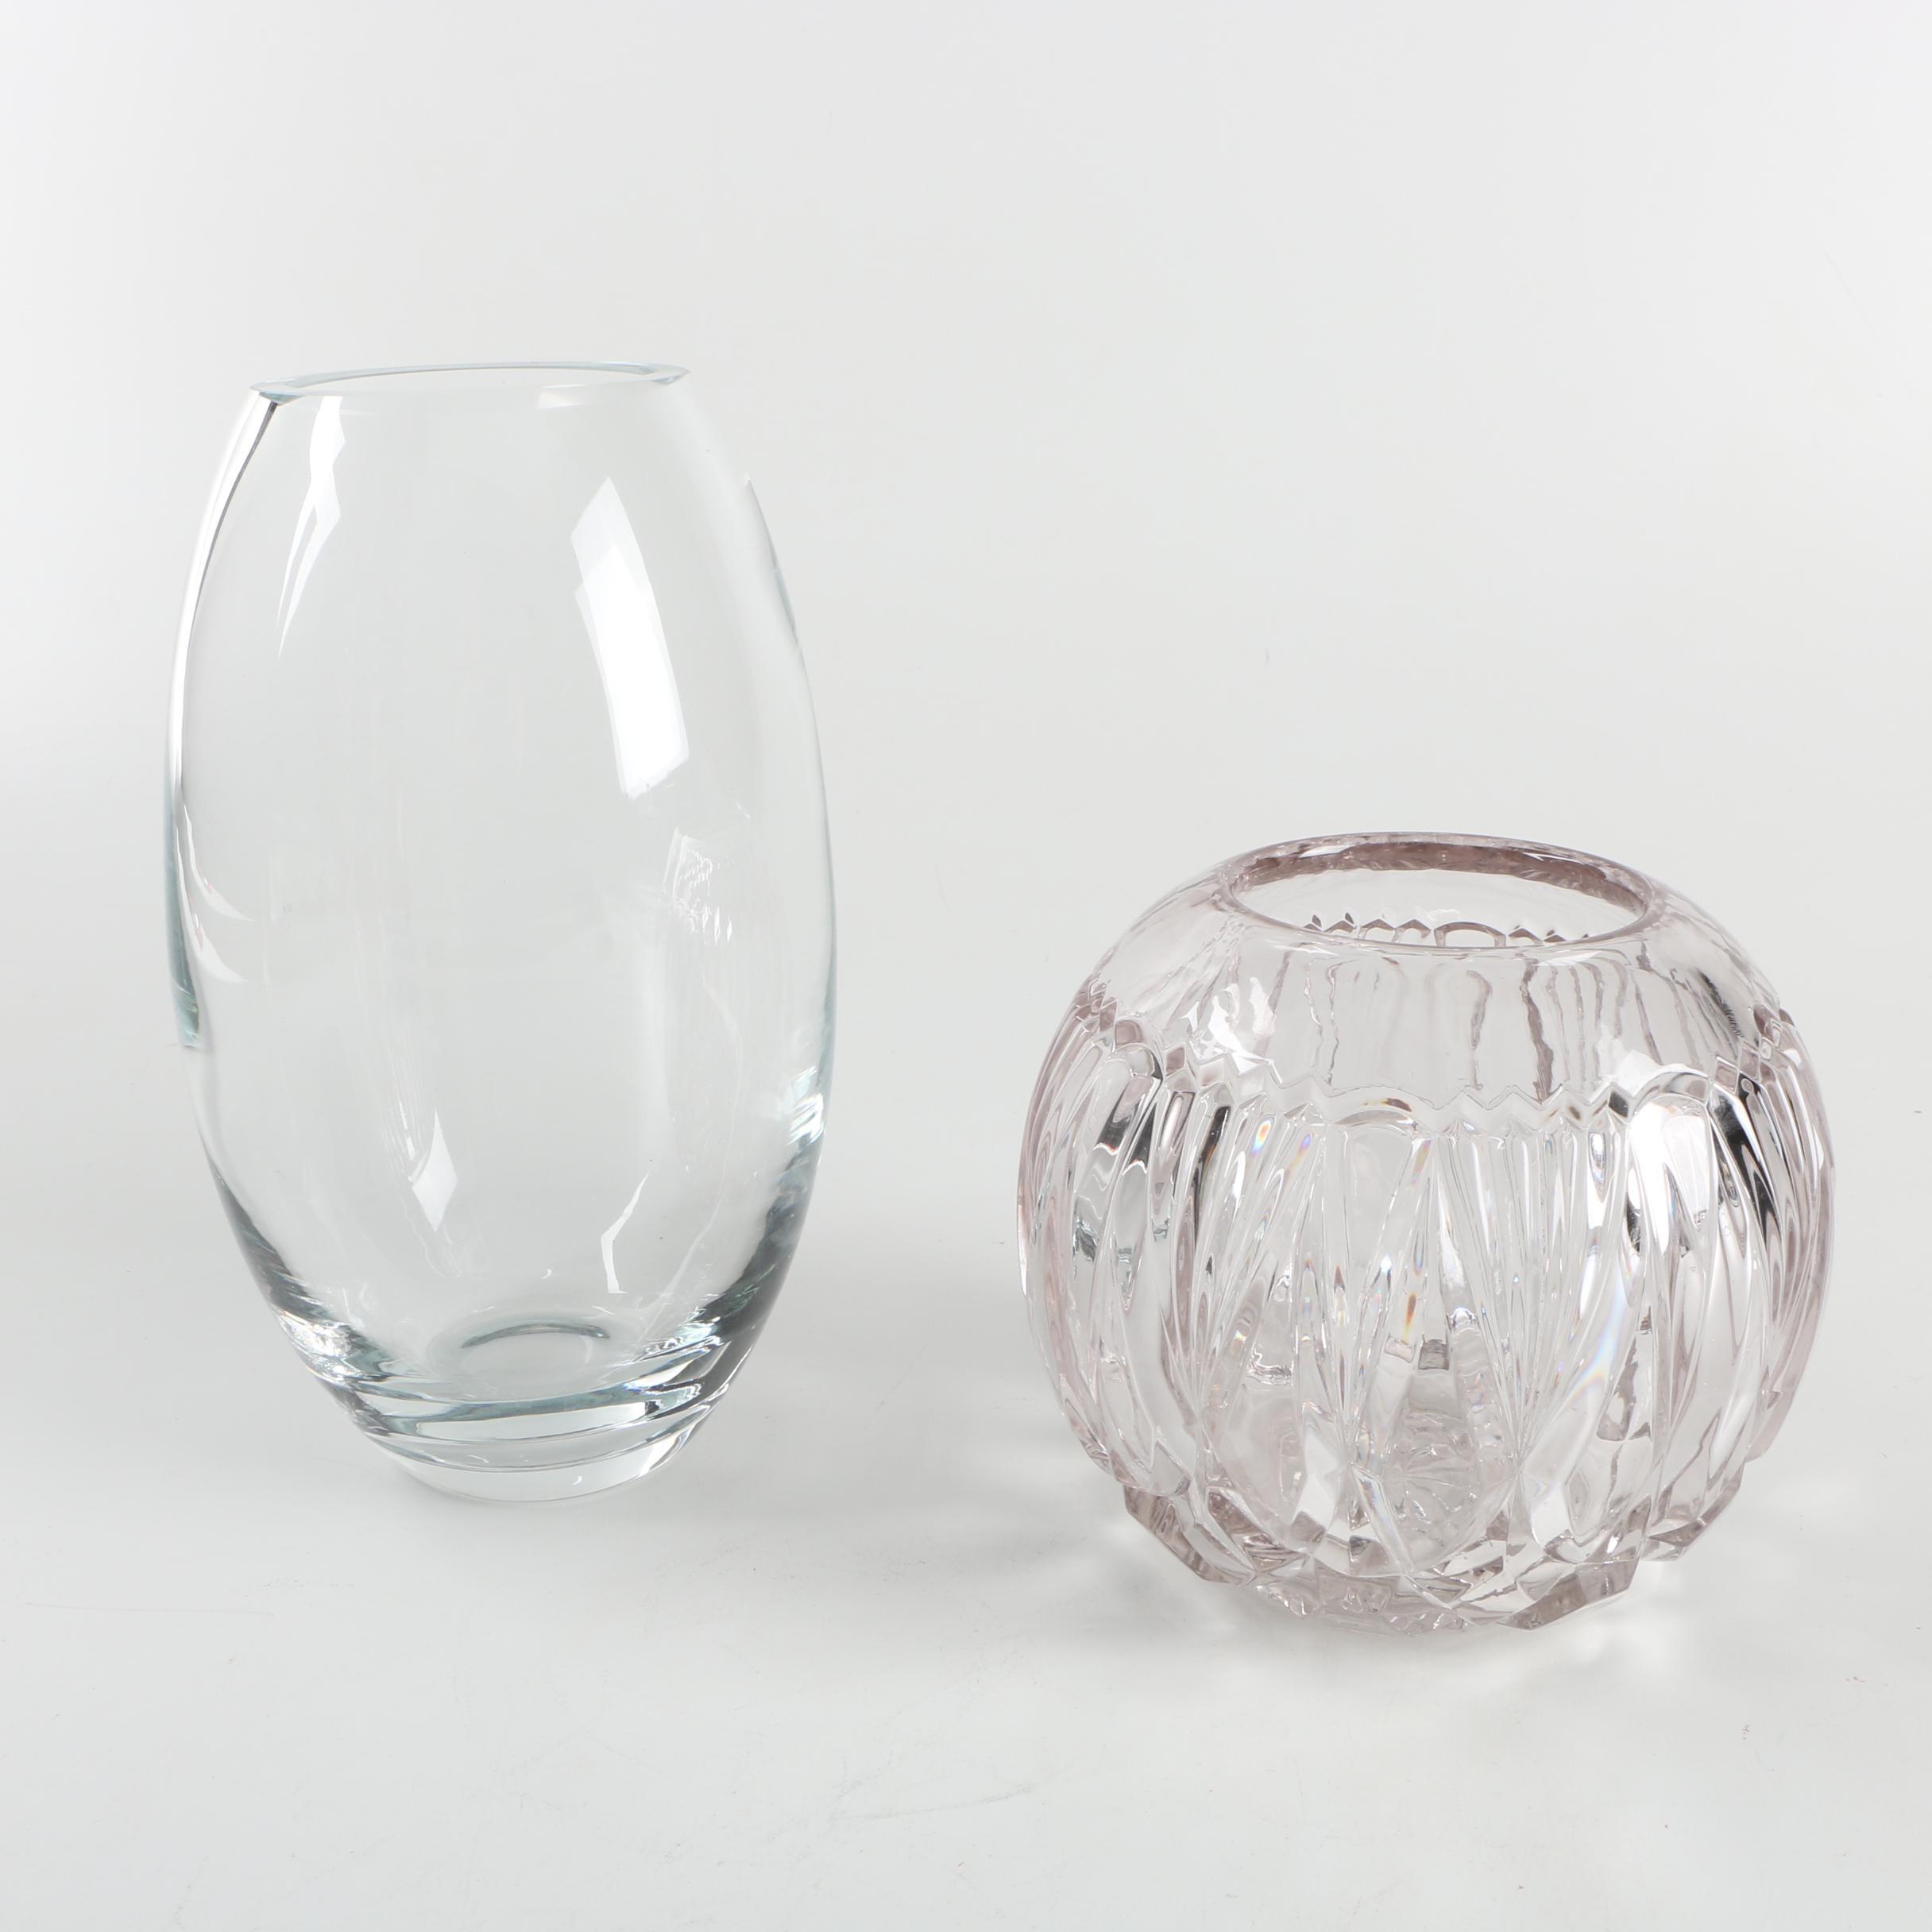 Pair of Vases including Pressed Crystal